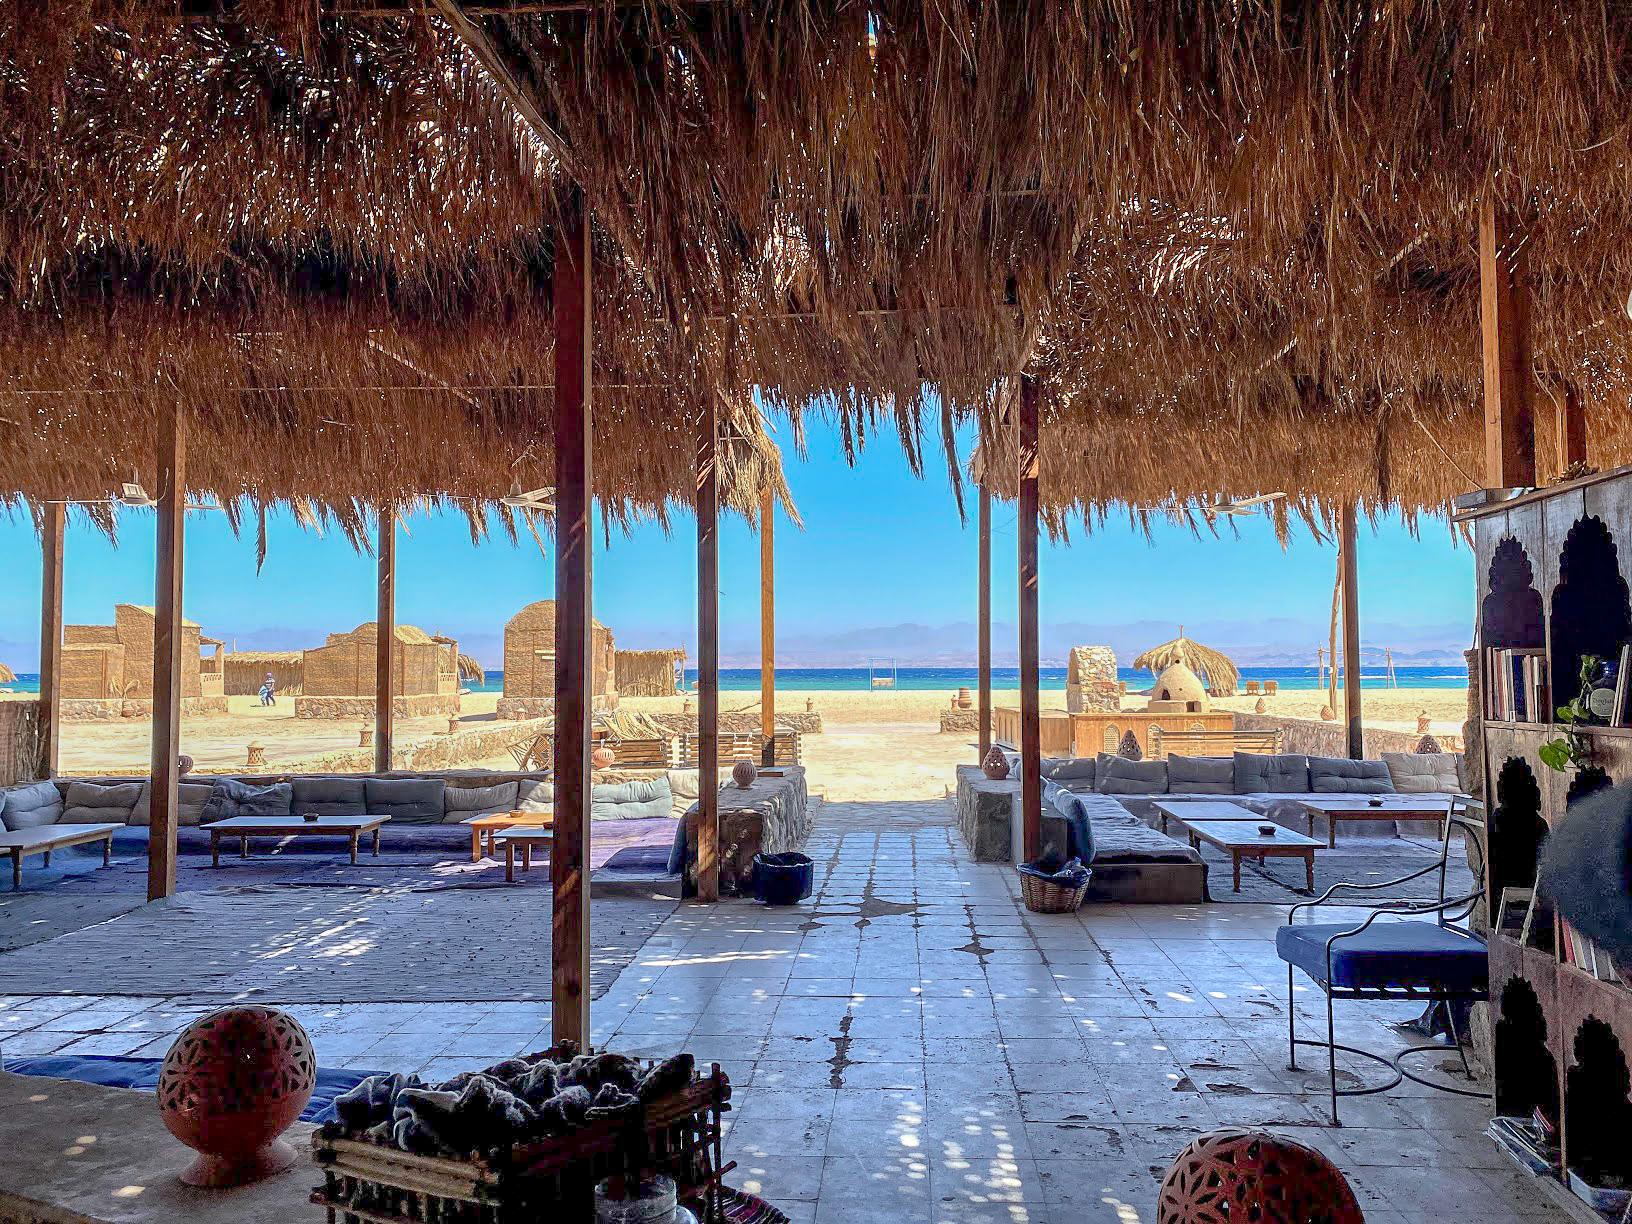 The terrace at Aqua Sun, Gulf of Aqaba, Egypt